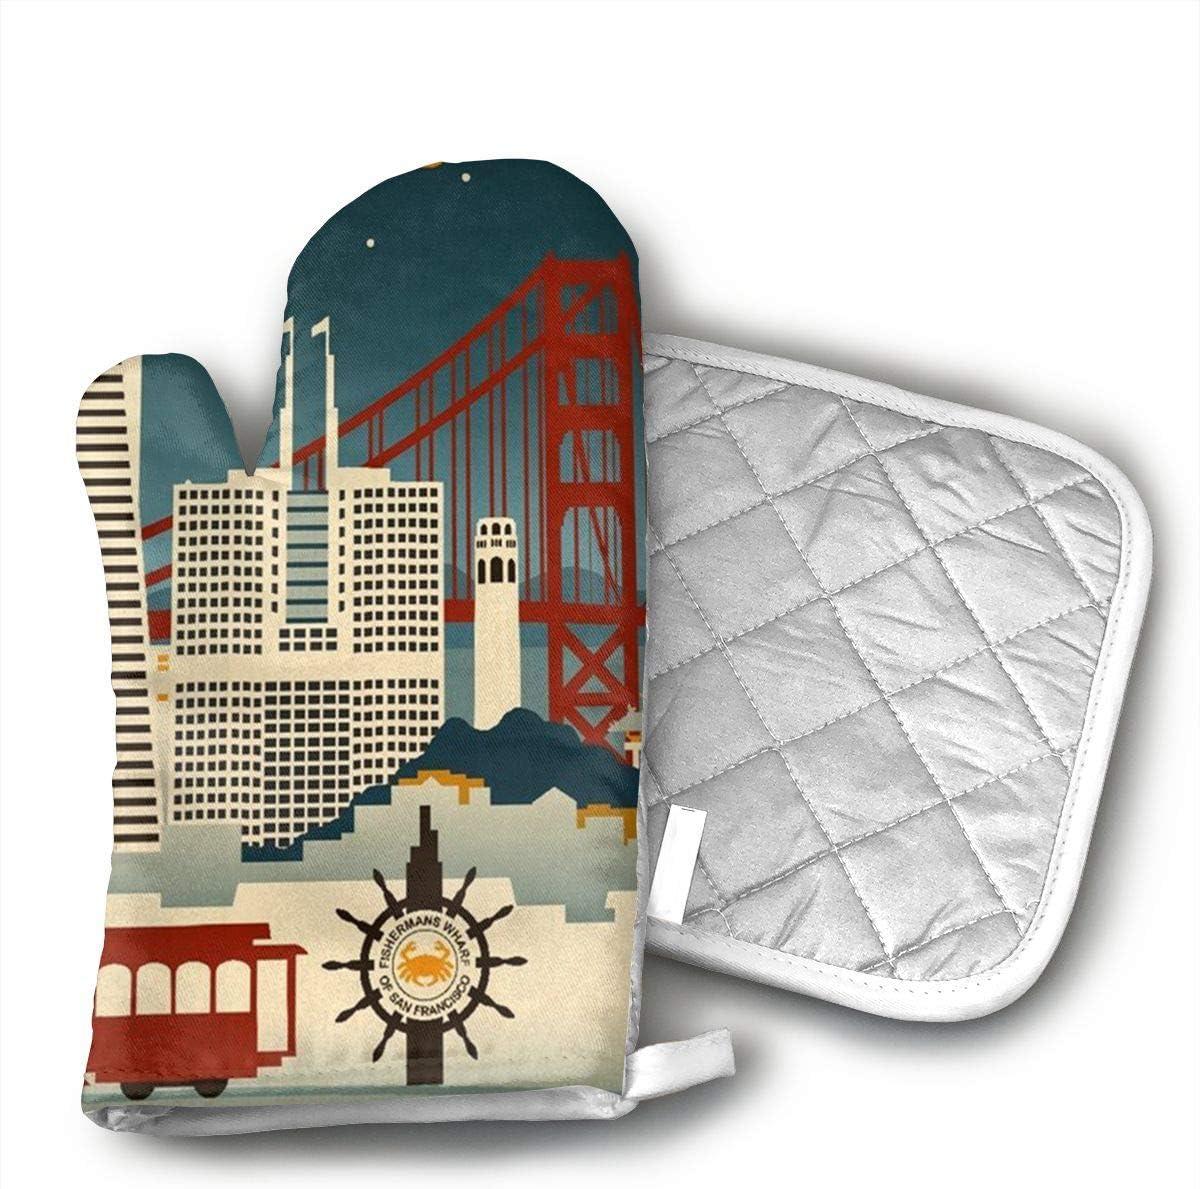 GUYDHL Unisex Oven Mitt and Pot Holder for San Francisco, California - Retro Skyline - 2 Pair